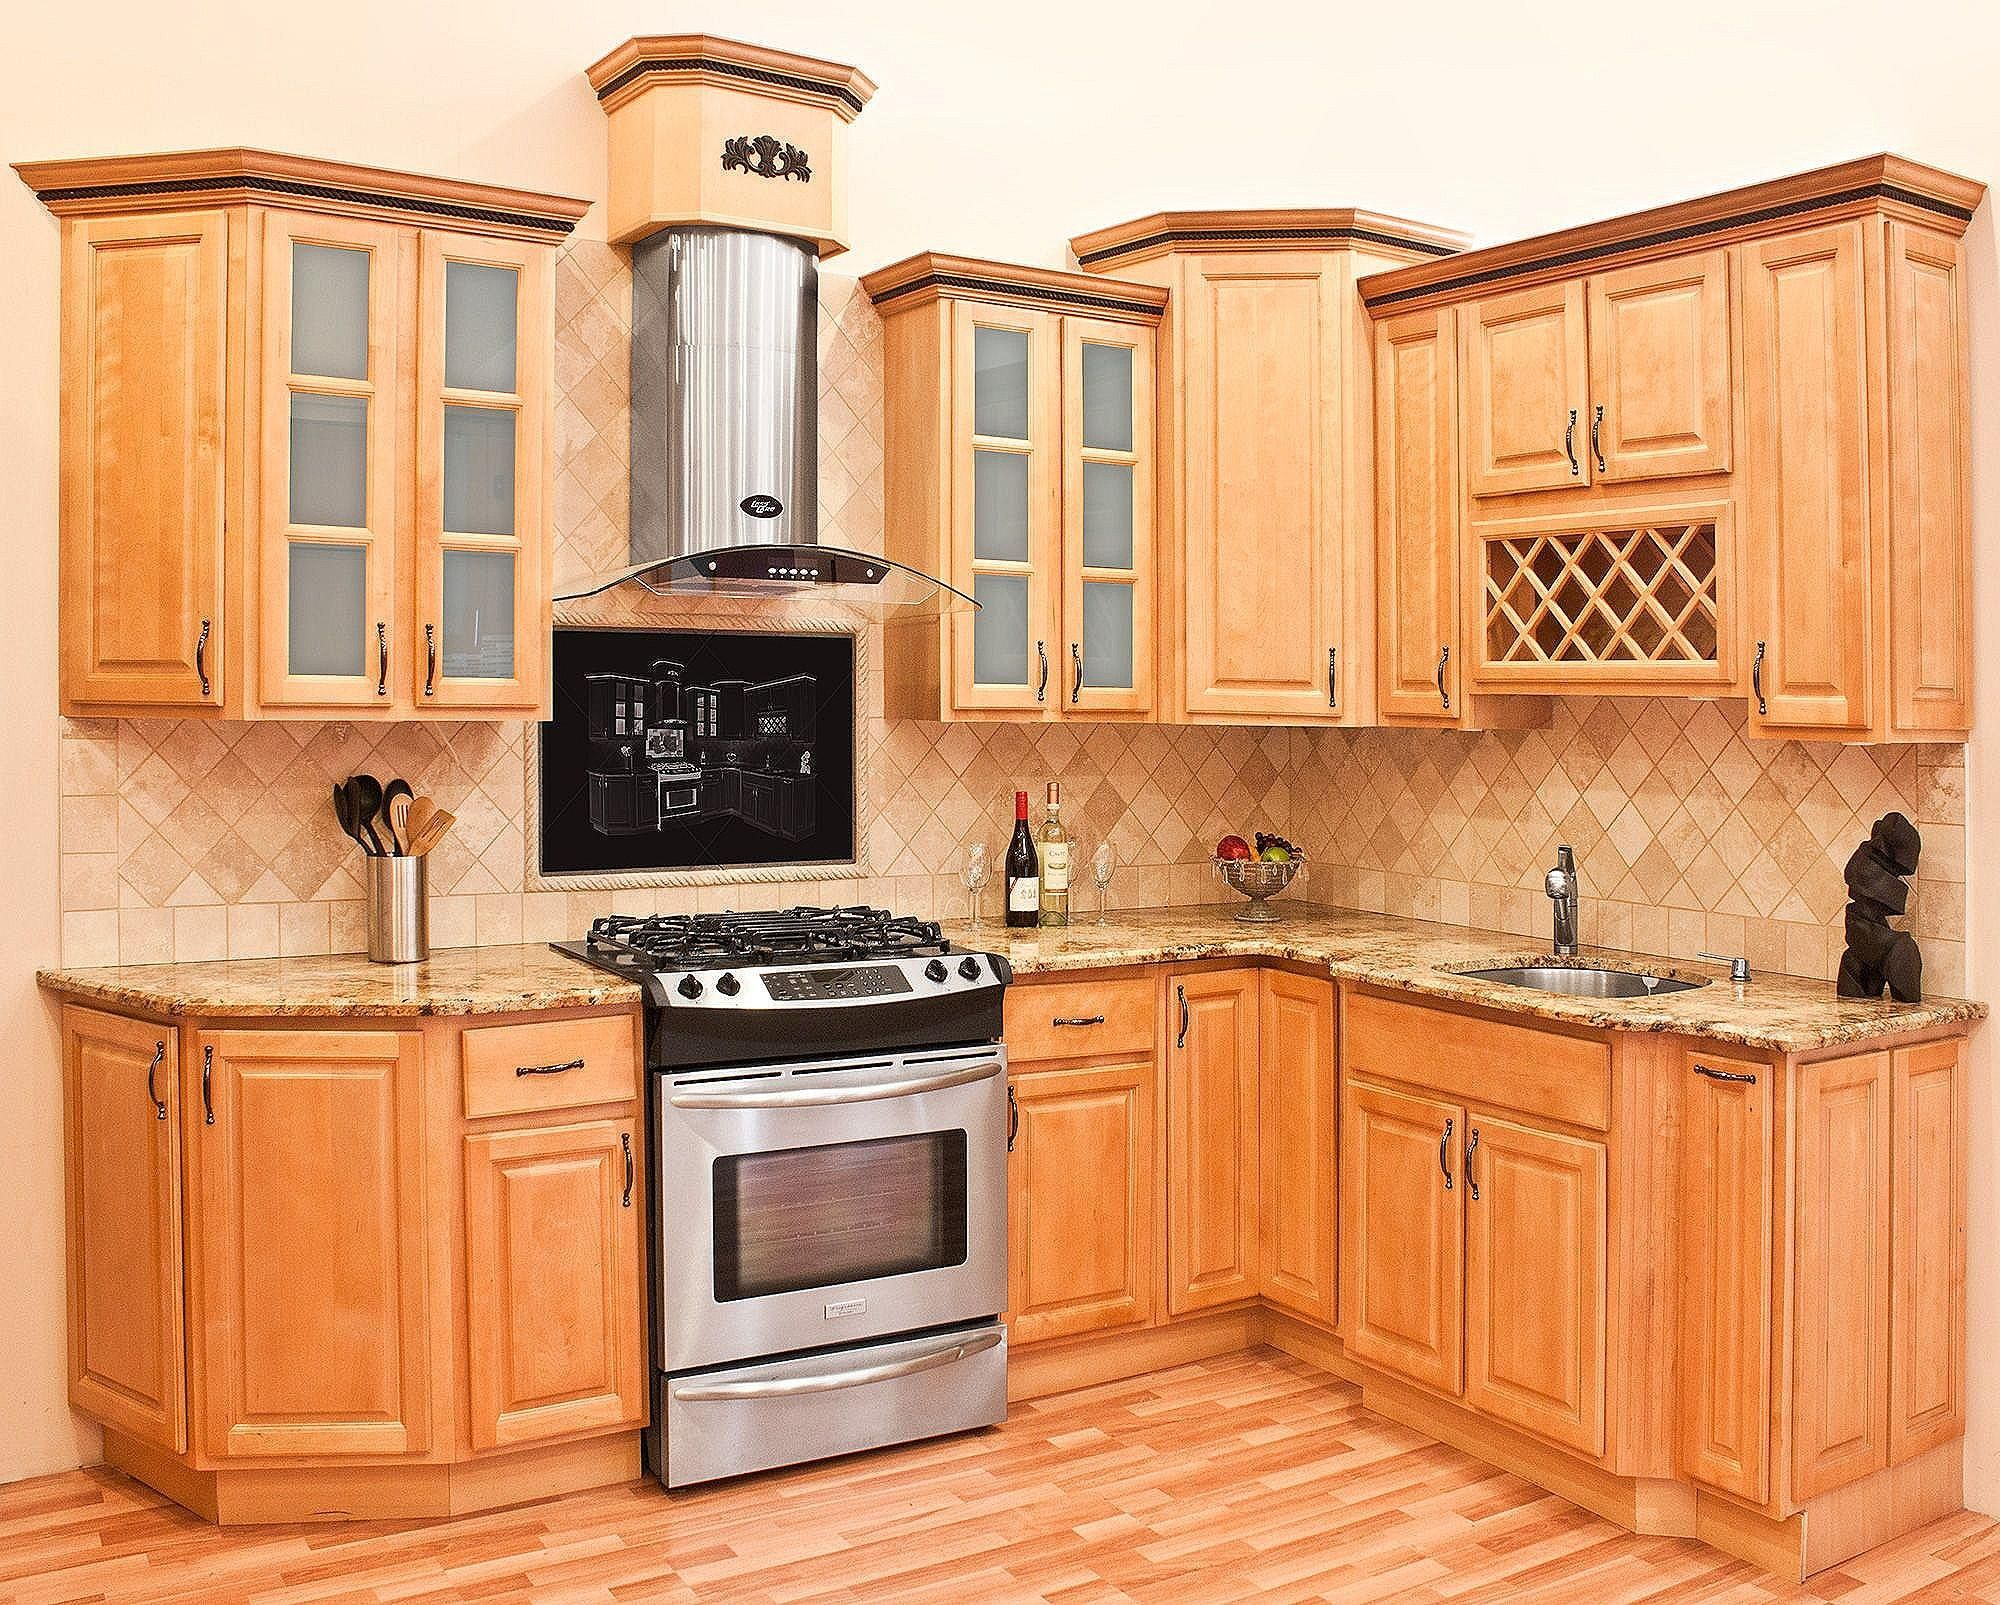 Beautiful Small Kitchen Ideas On A Budget | Kitchen ... on Maple Cabinets Kitchen Ideas  id=25010